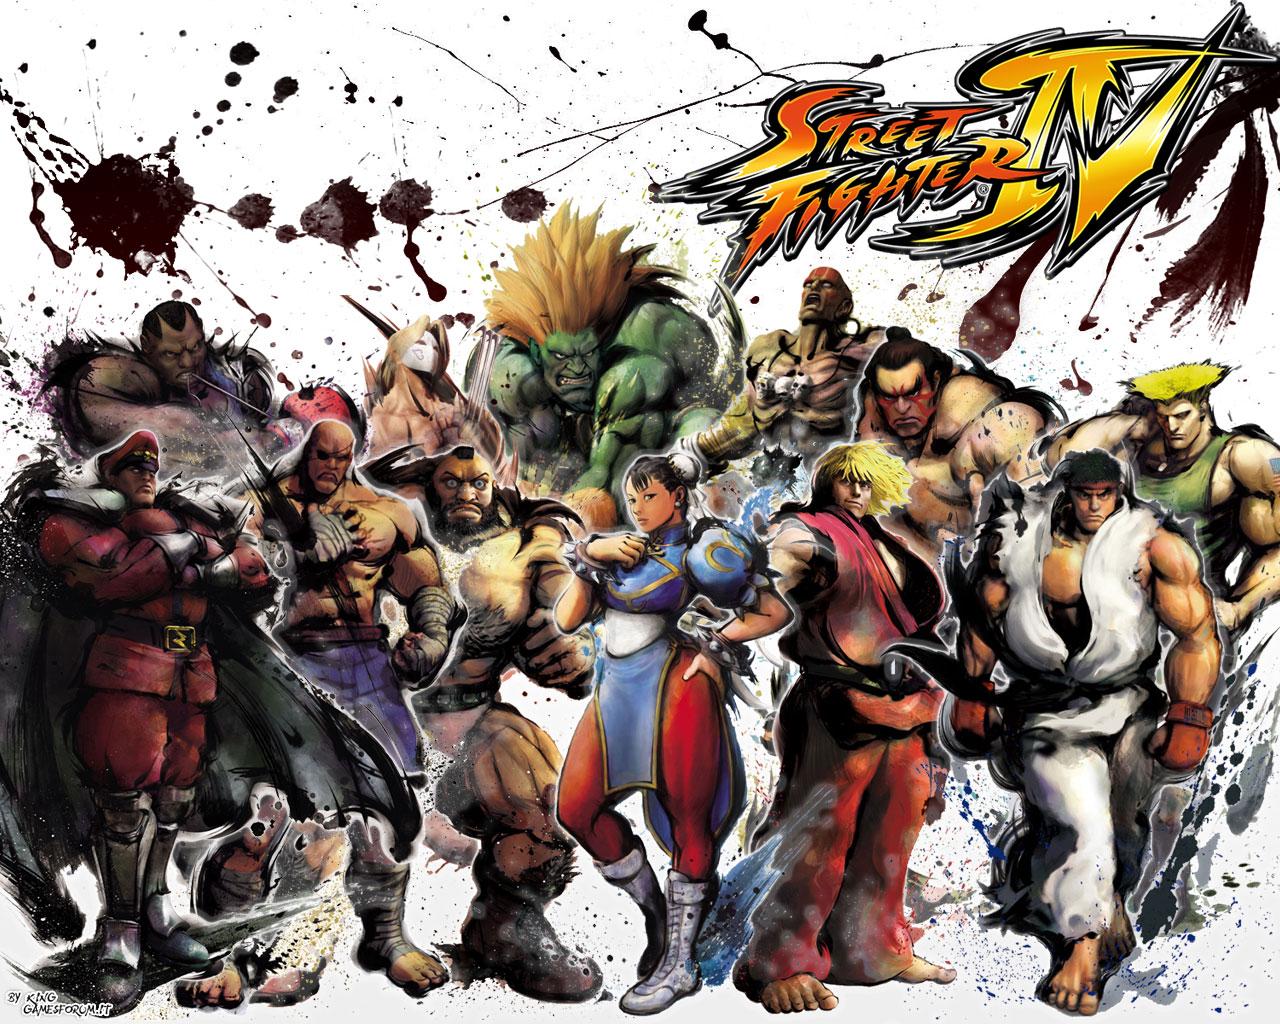 Обои Street Fighter 4 Войны